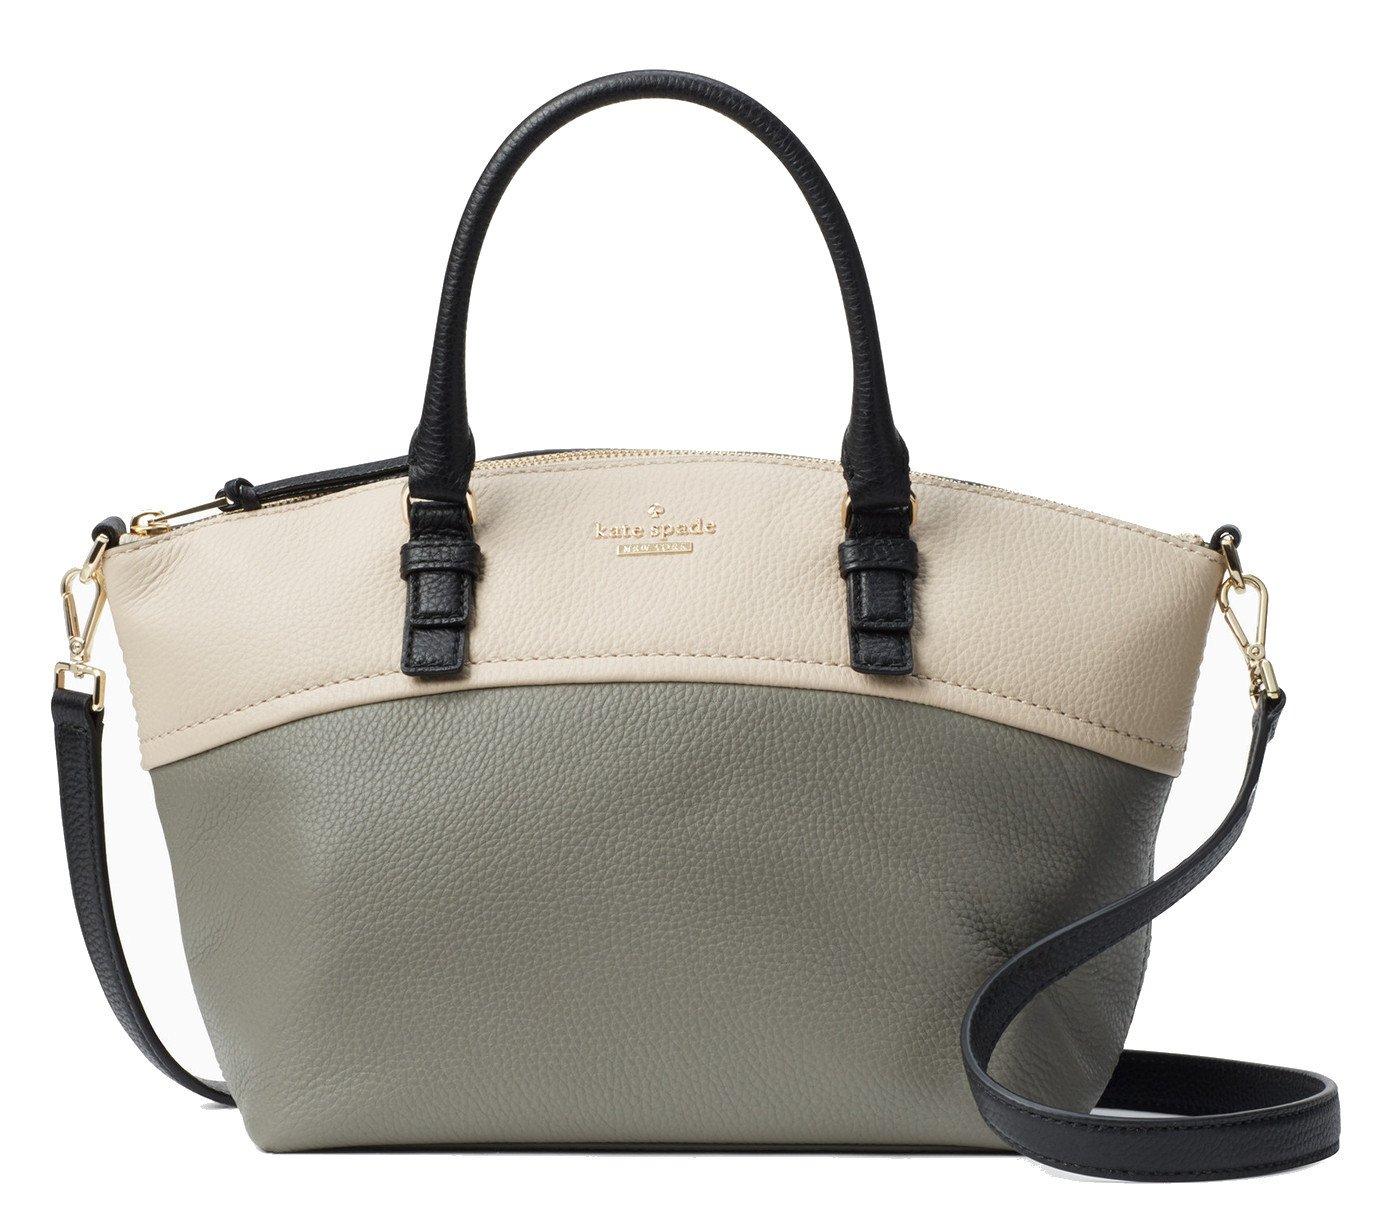 Kate Spade New York Jackson Street Small Dixon Leather Bag , Willow Soft Porcelain Black Multi